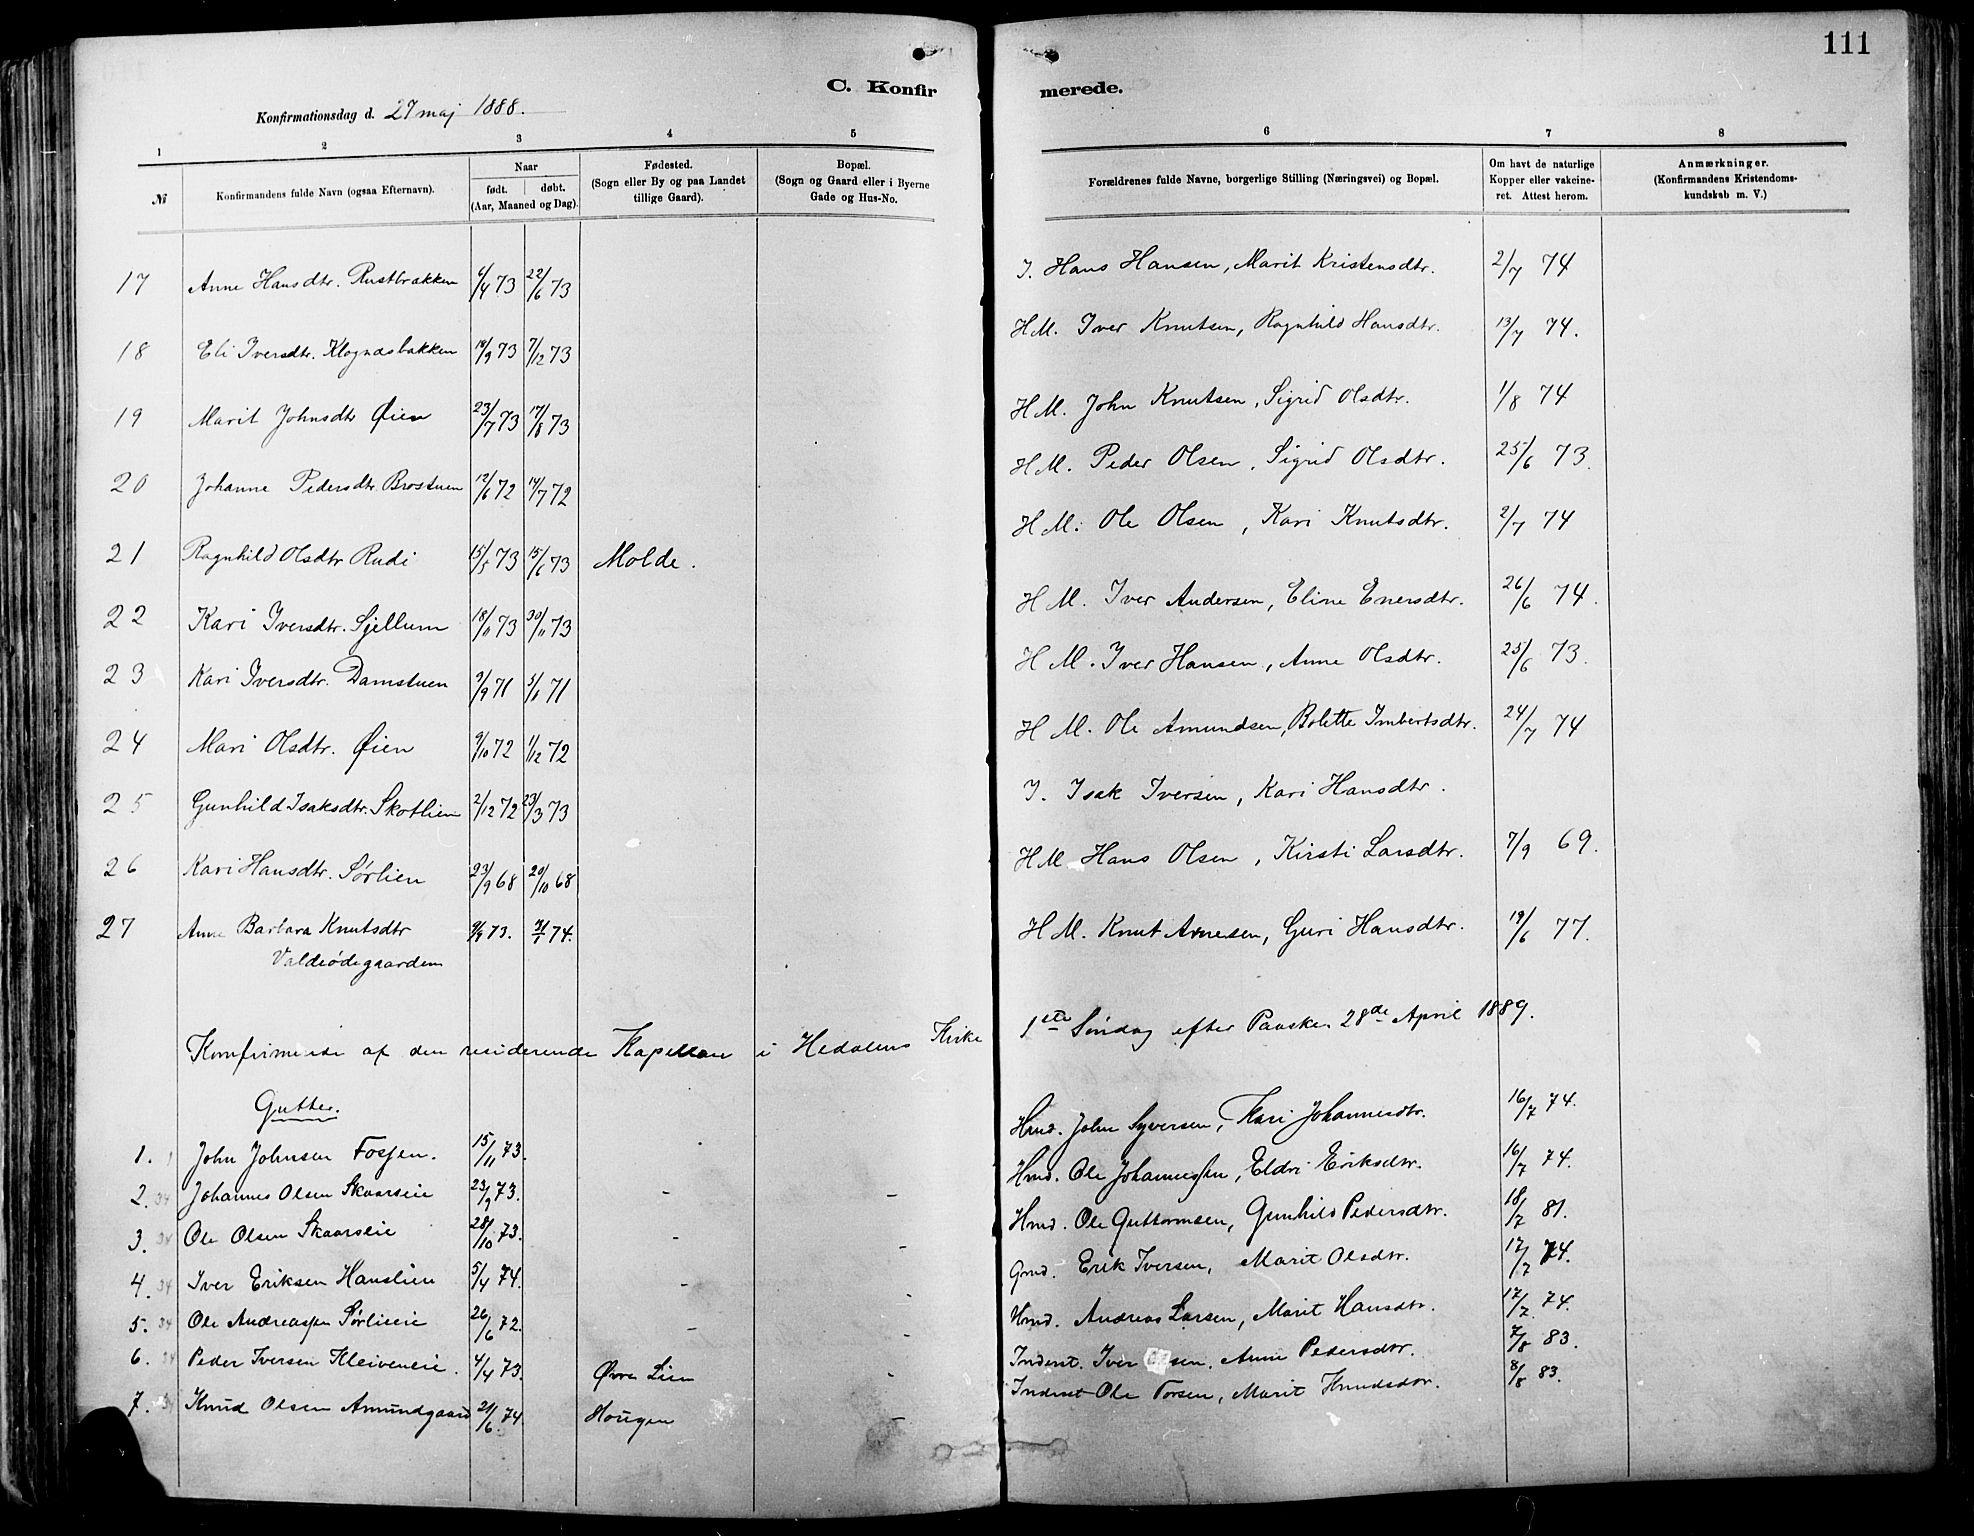 SAH, Vågå prestekontor, Ministerialbok nr. 9, 1886-1904, s. 111